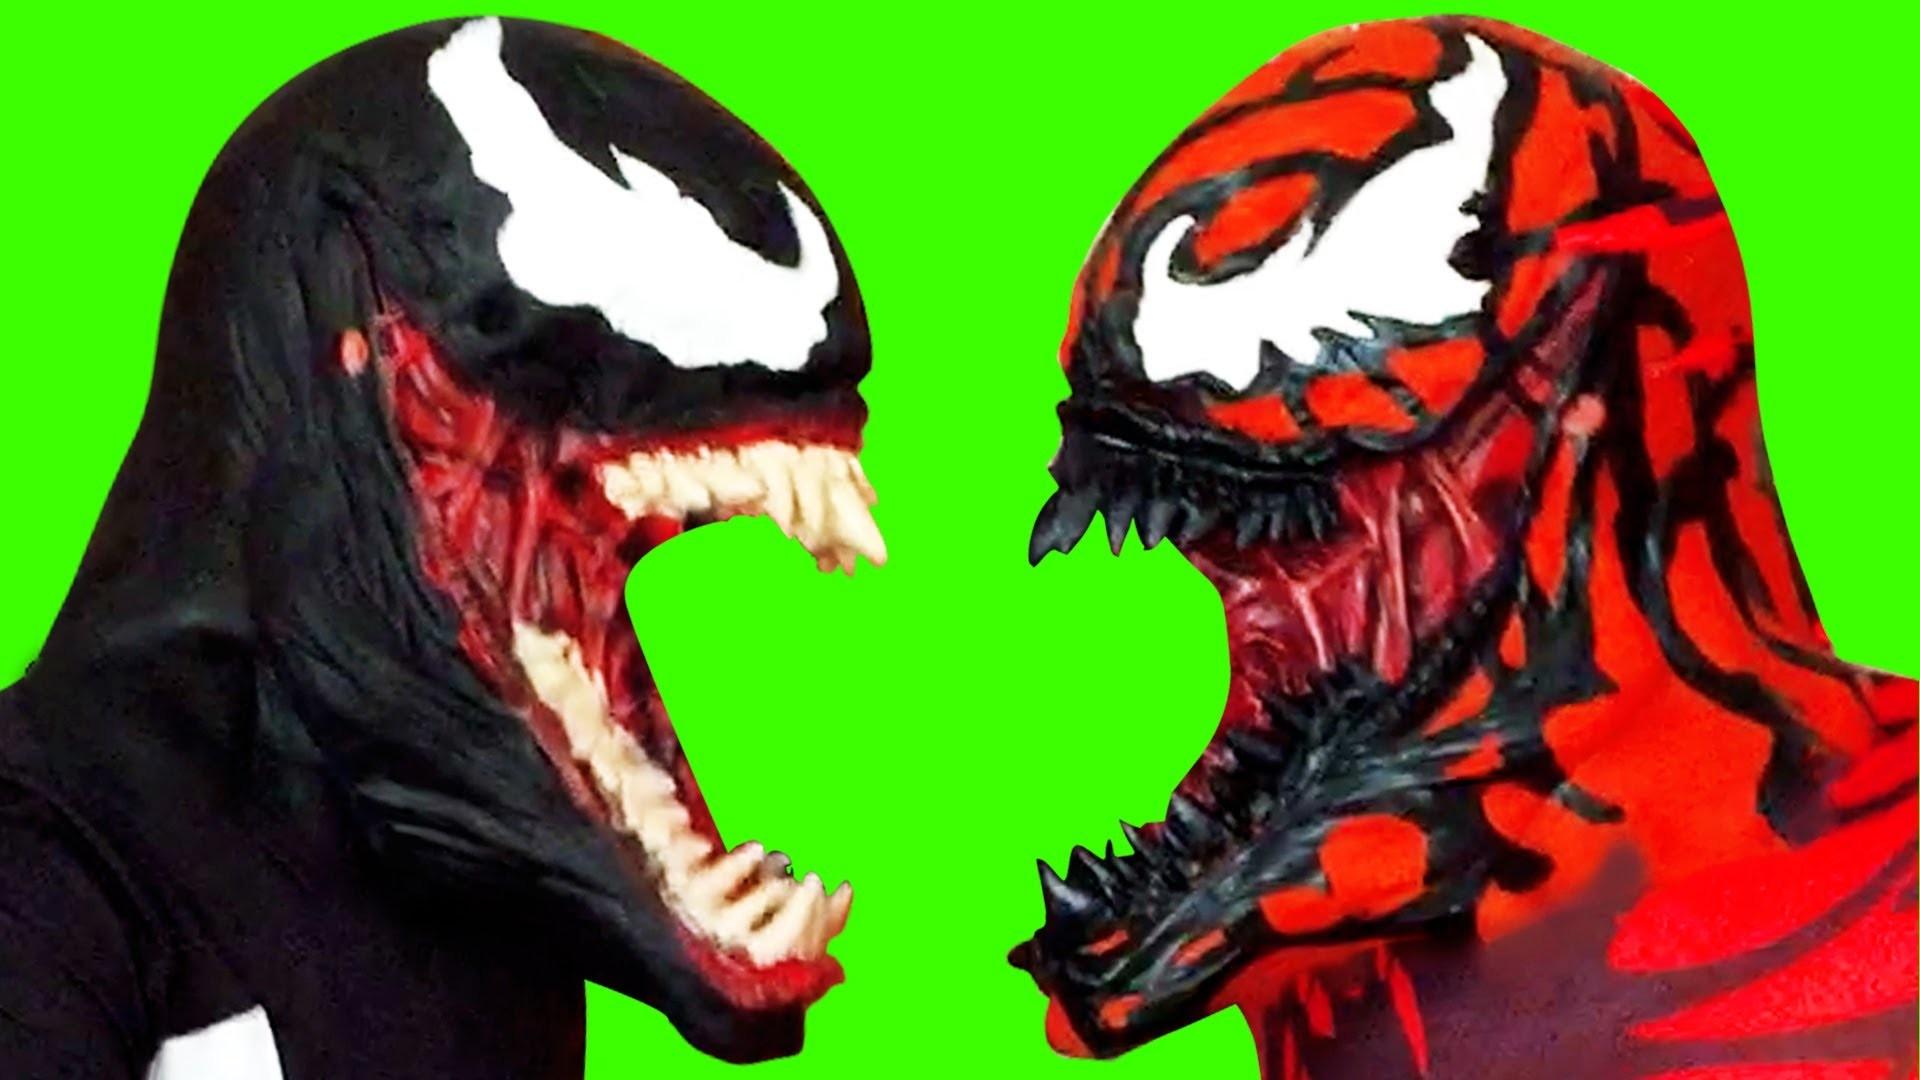 Spiderman Villains Venom vs Carnage wM&M's Candy || Real Life Superhero  Movie